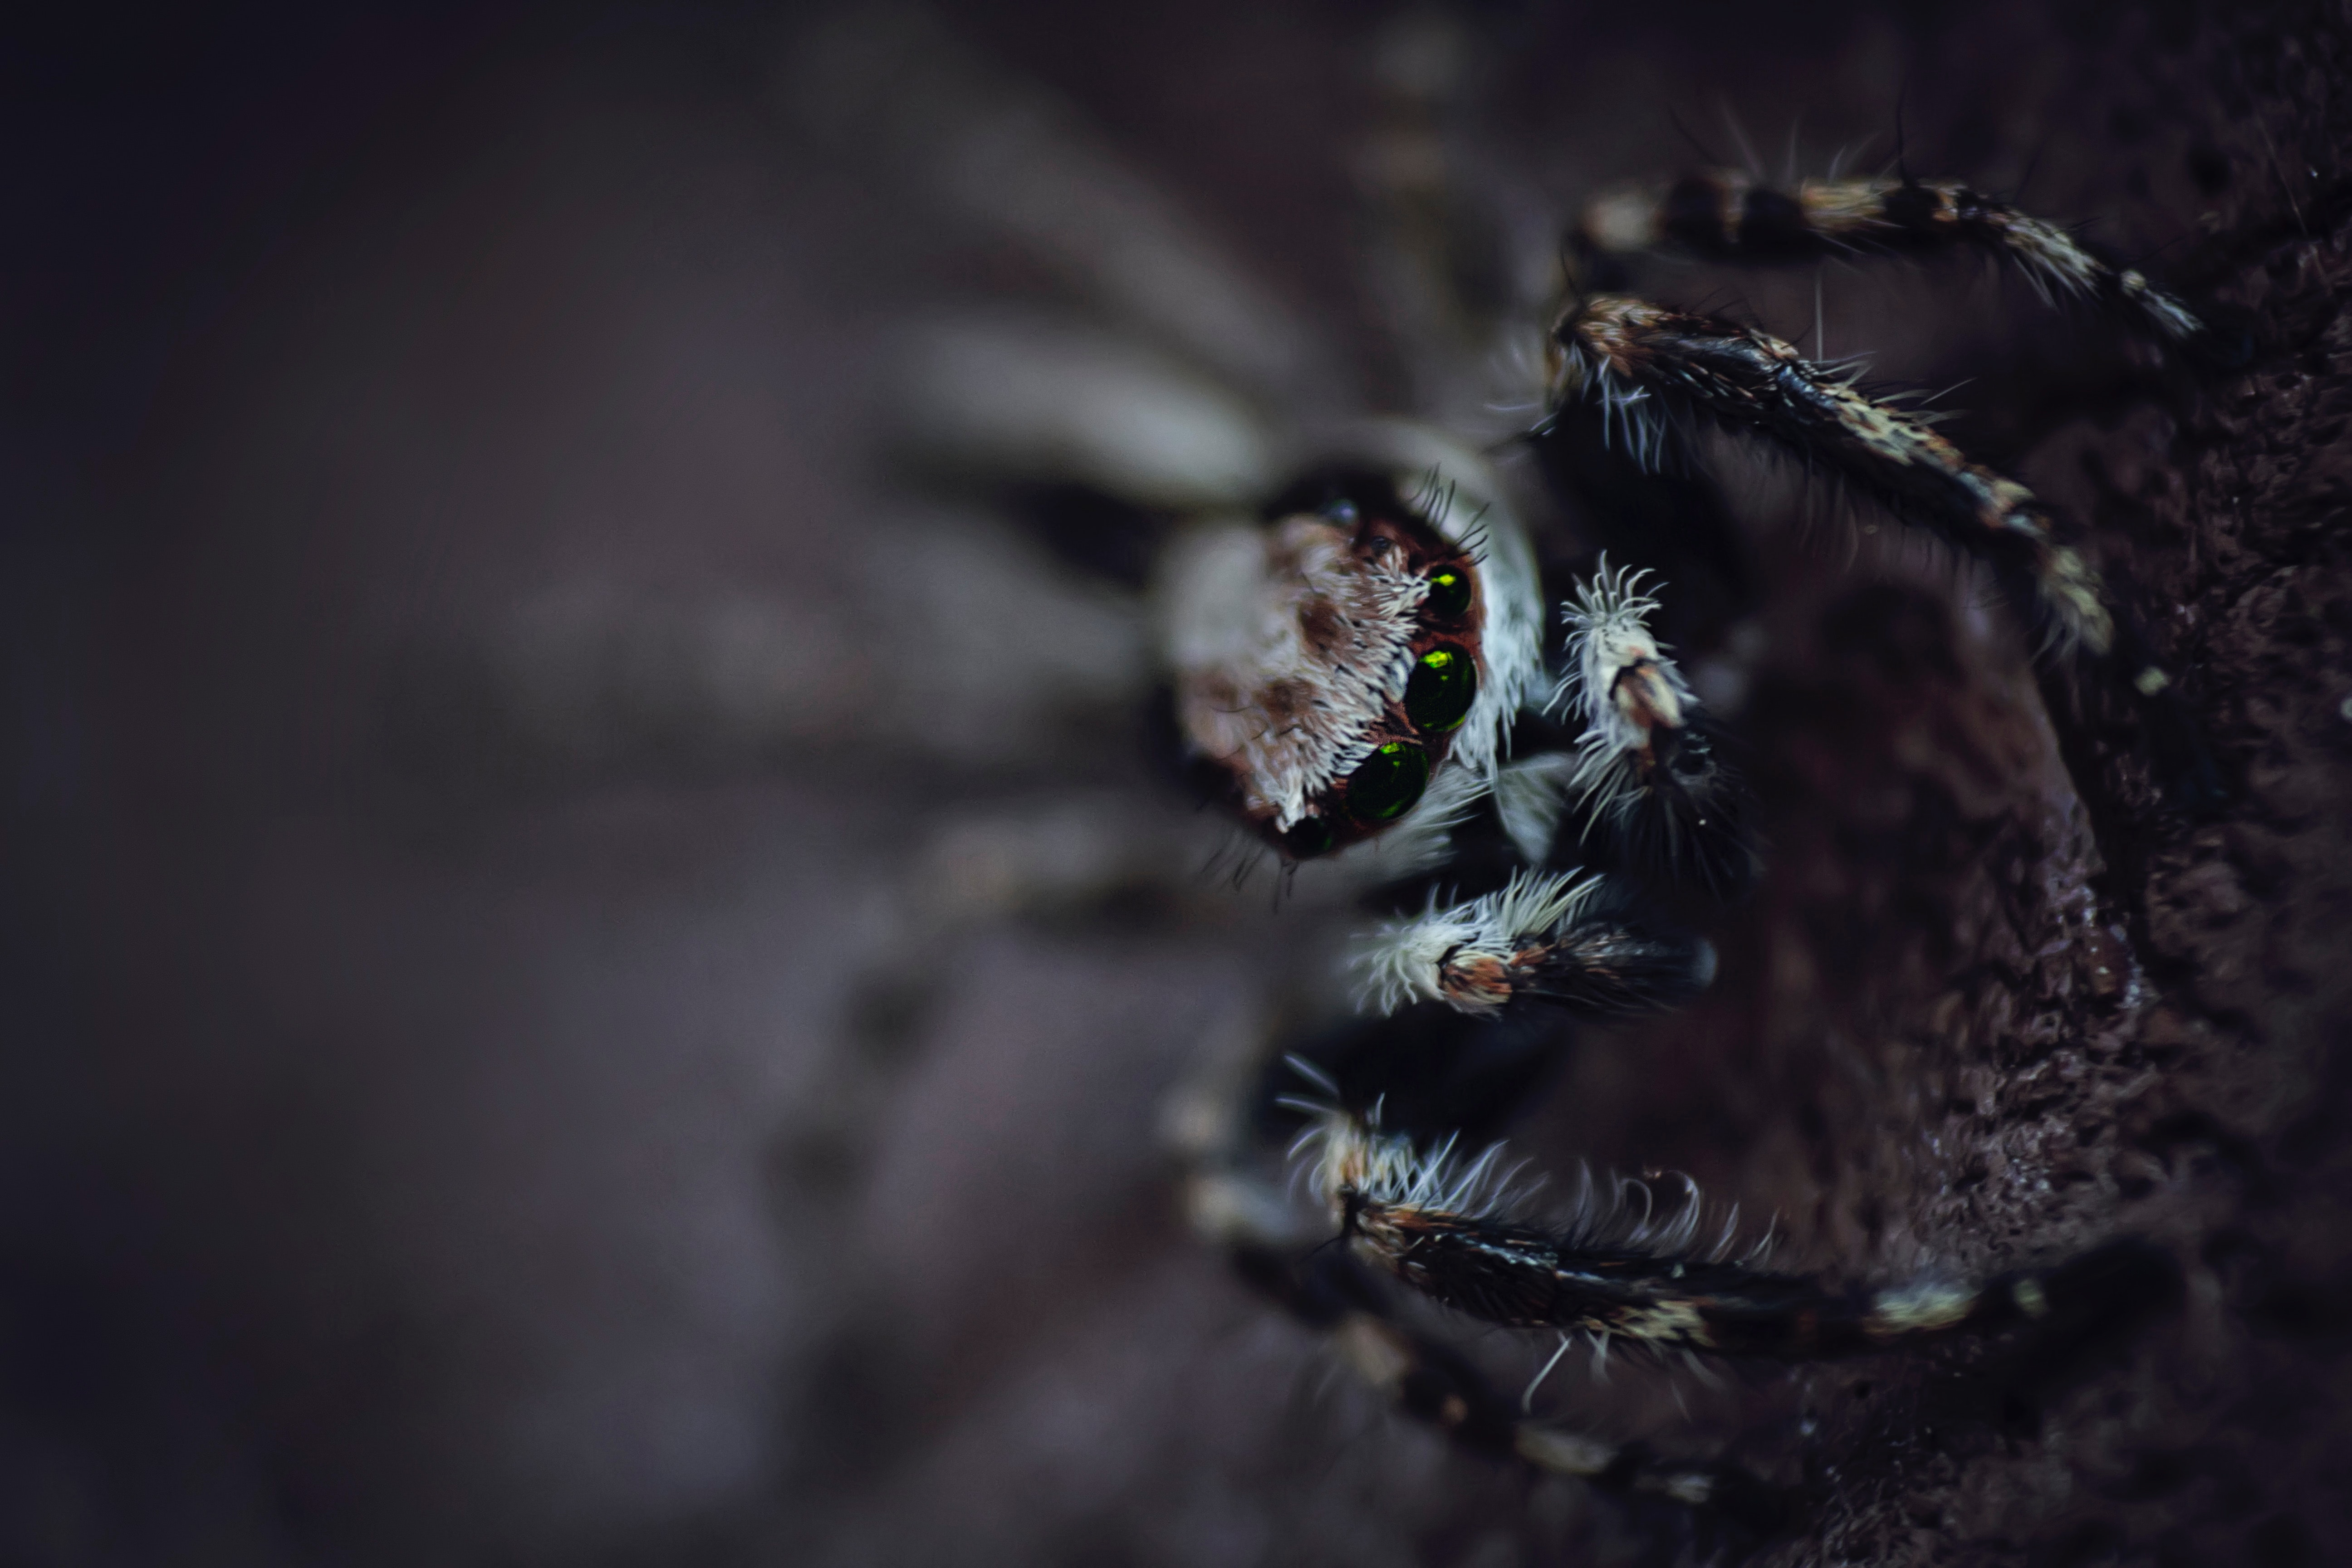 Black and white spider photo